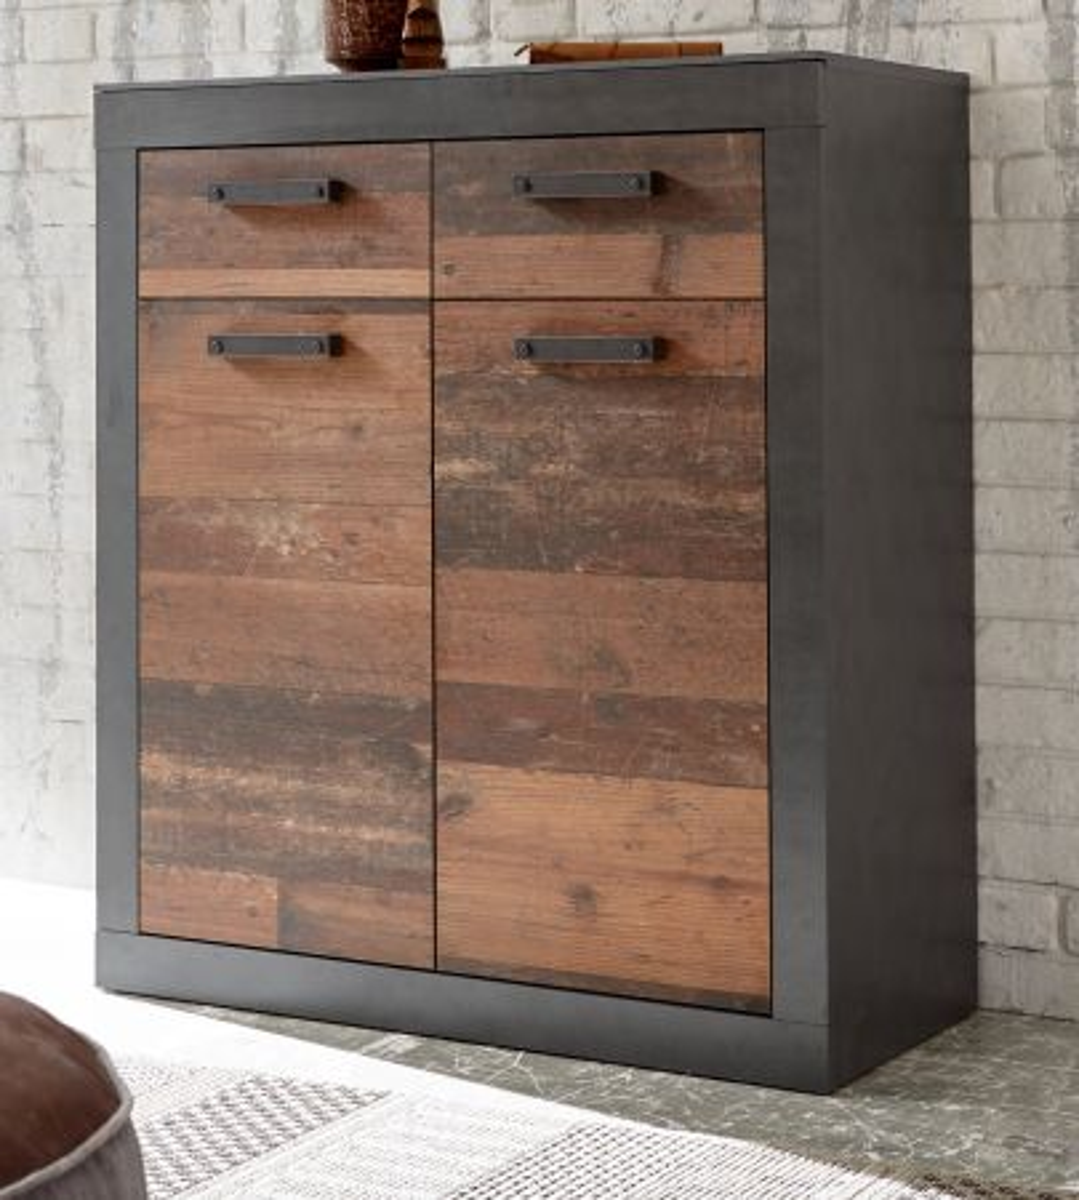 Kommode Ward in Used Wood Shabby und Matera grau 92 x 104 cm